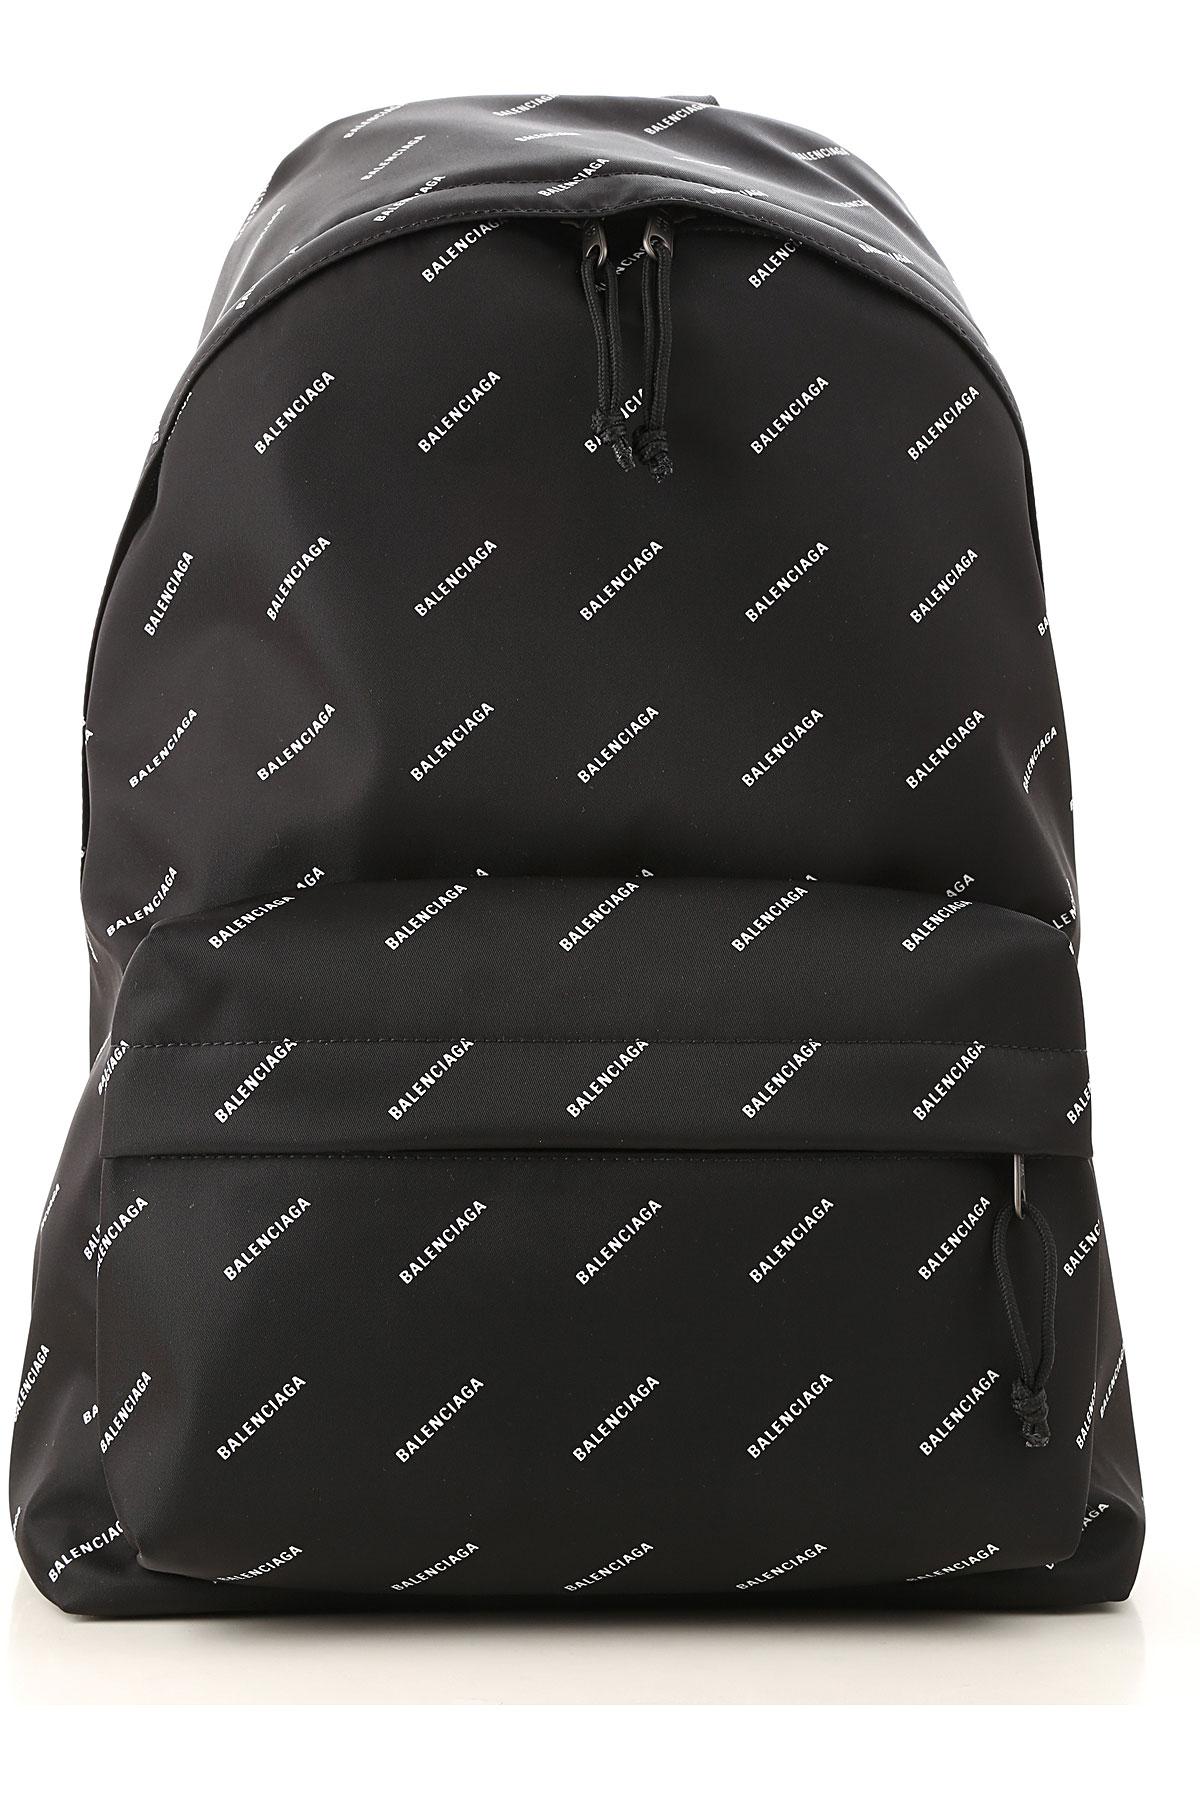 Image of Balenciaga Backpack for Men, Black, Nylon, 2017